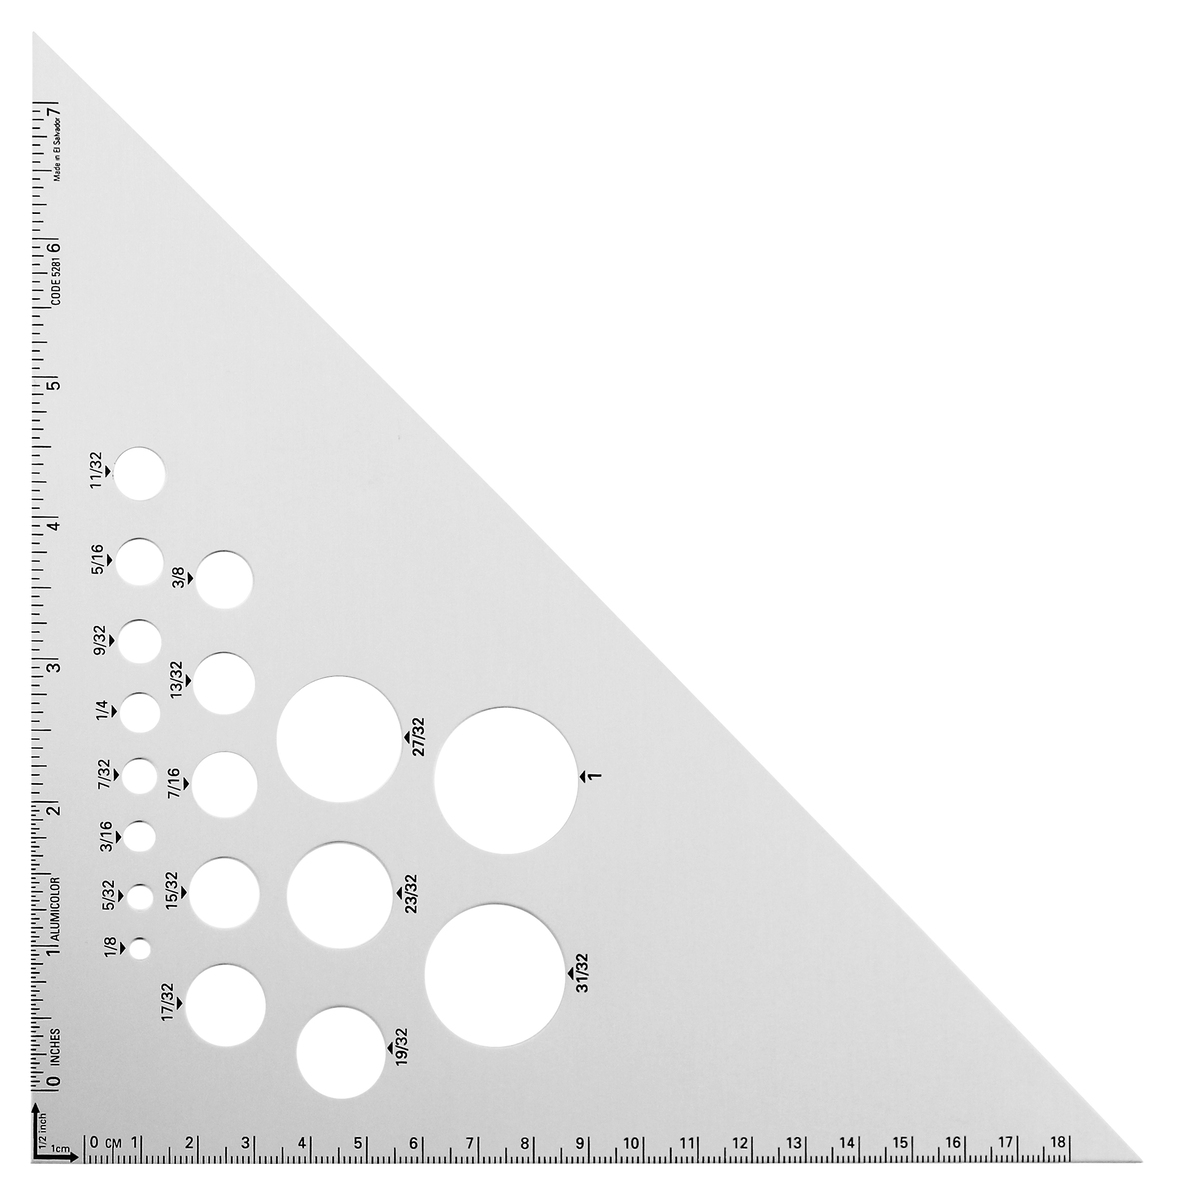 8 inches Aluminum 5281-1 Alumicolor 45-90 Degree Drafting Triangle Silver